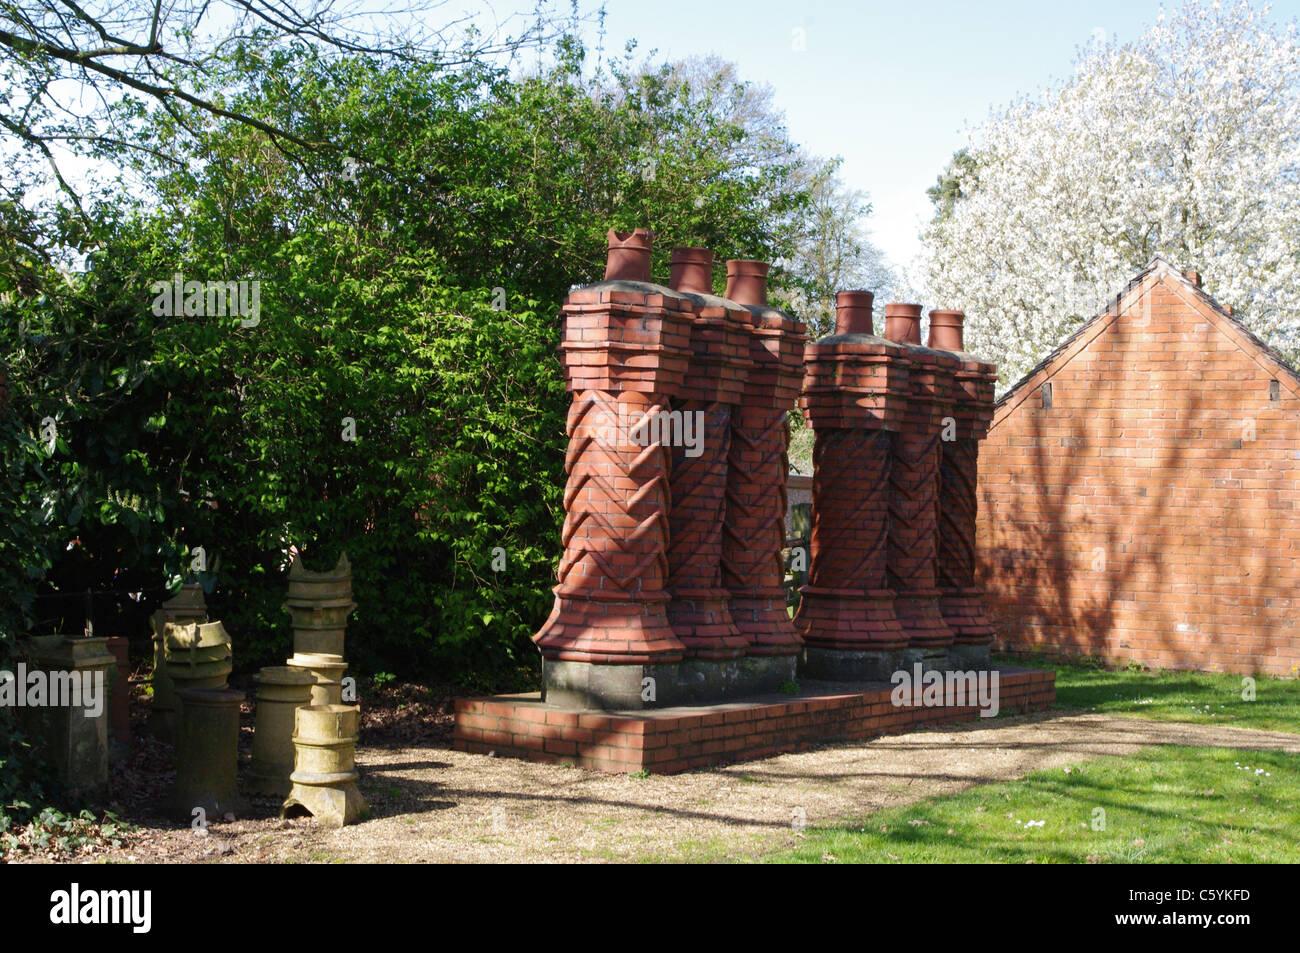 Victorian Chimneys at Avoncroft Museum, Bromsgrove - Stock Image